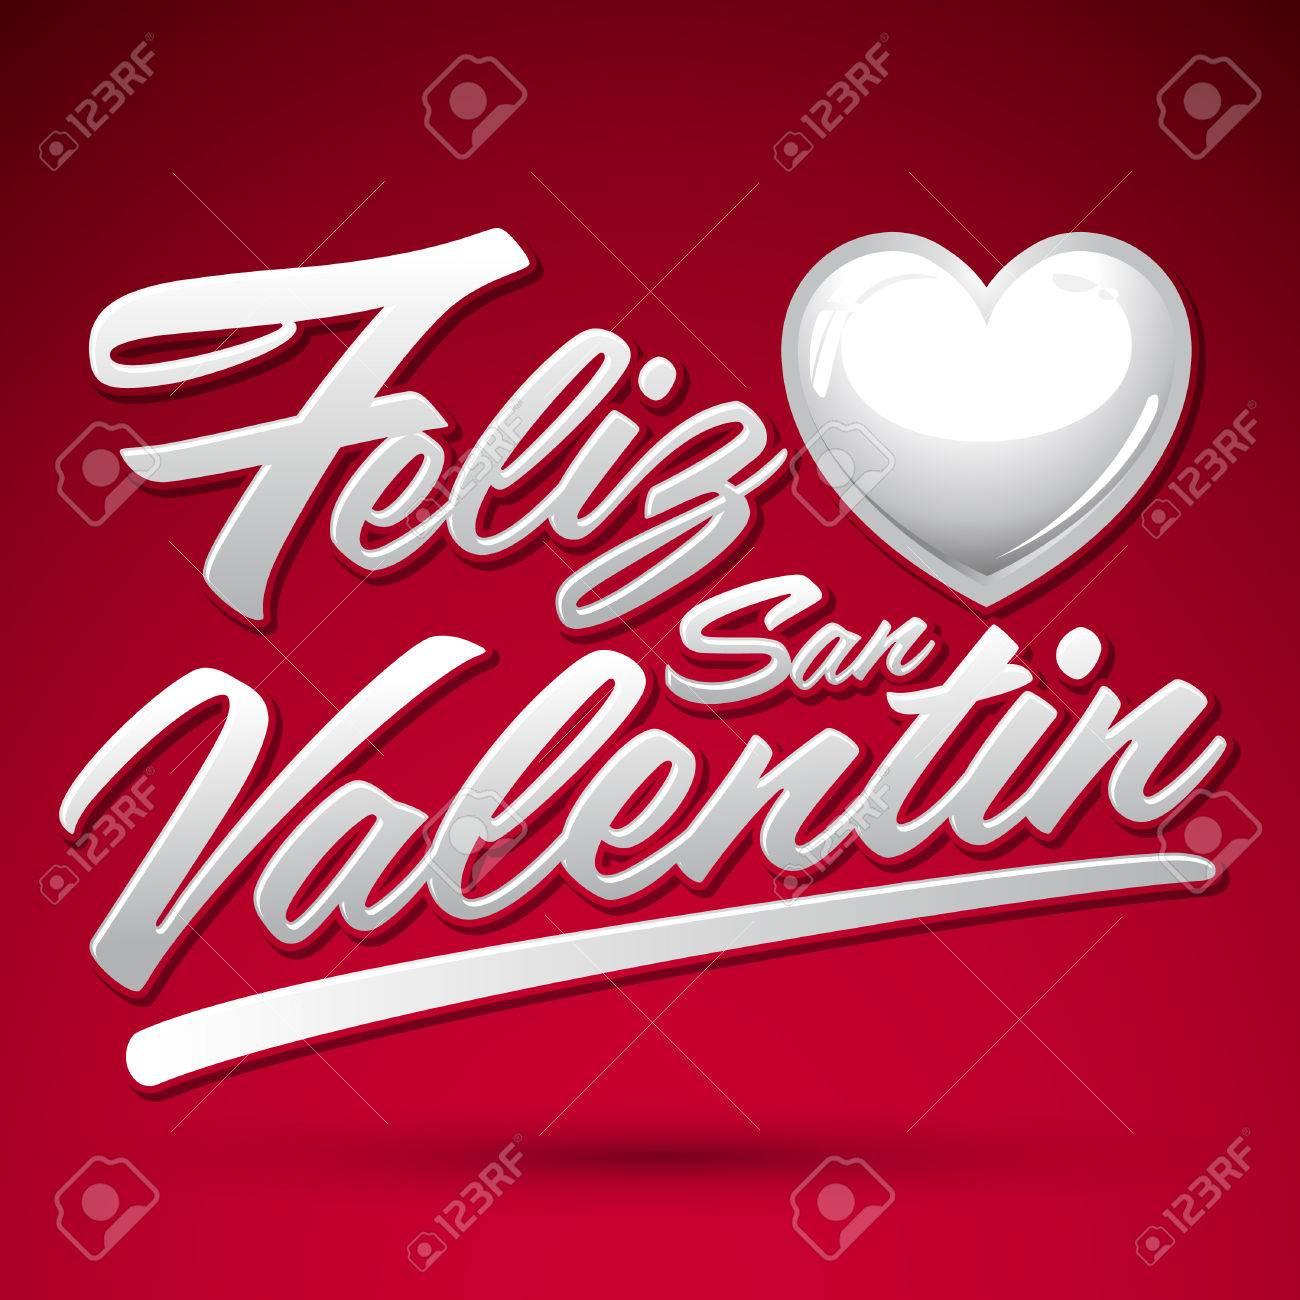 Feliz San Valentin Happy Valentines Spanish Text Vector